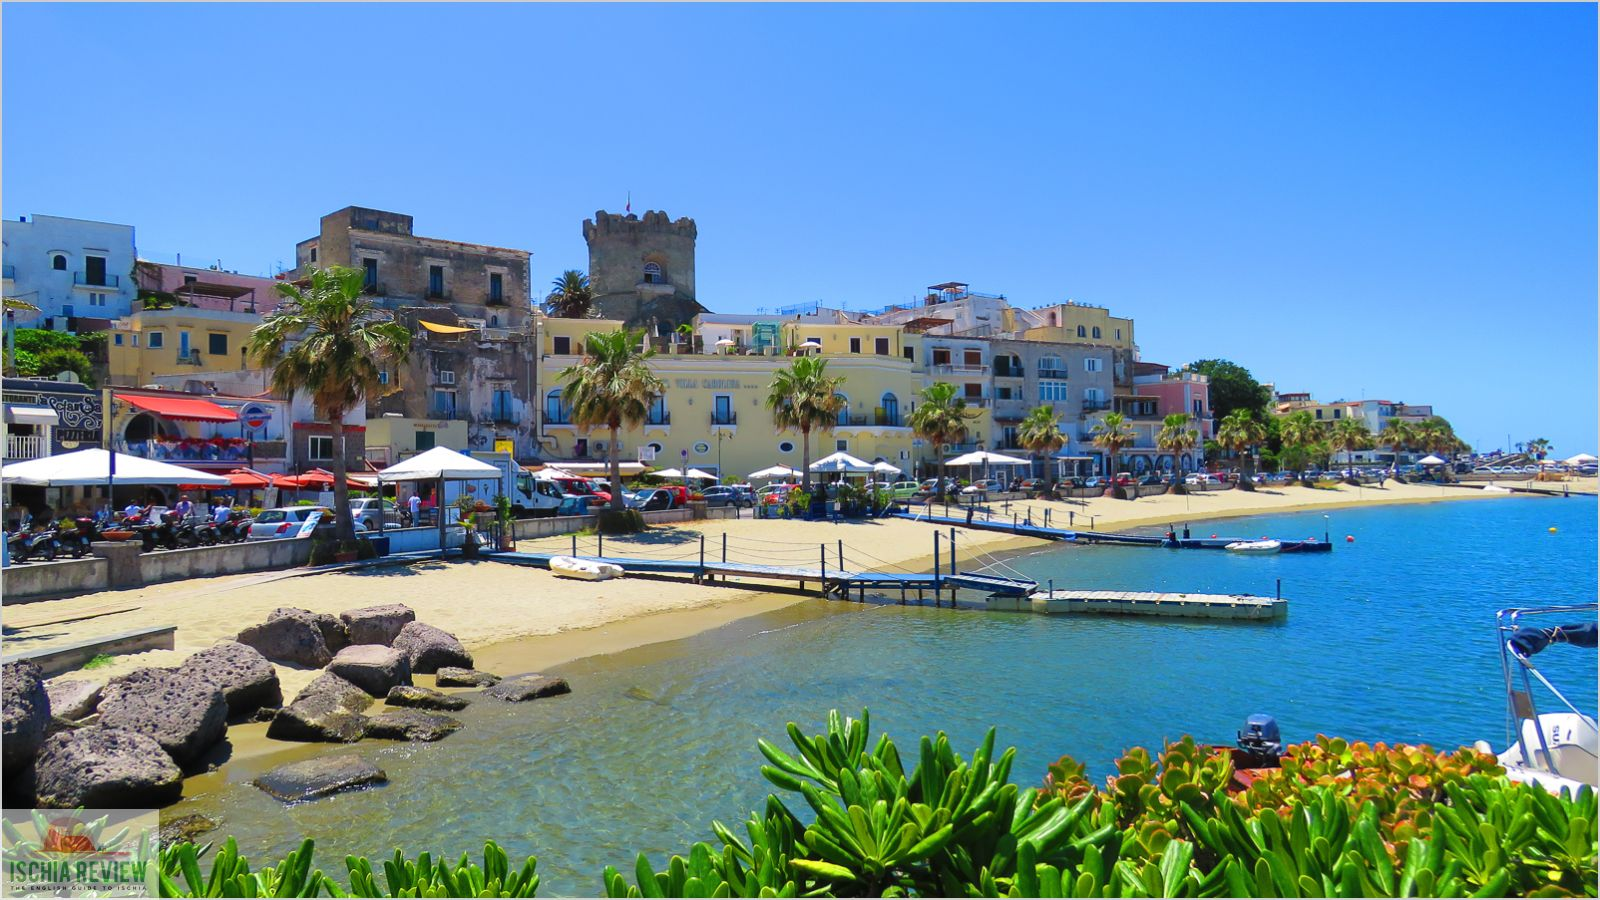 Forio Port, Ischia